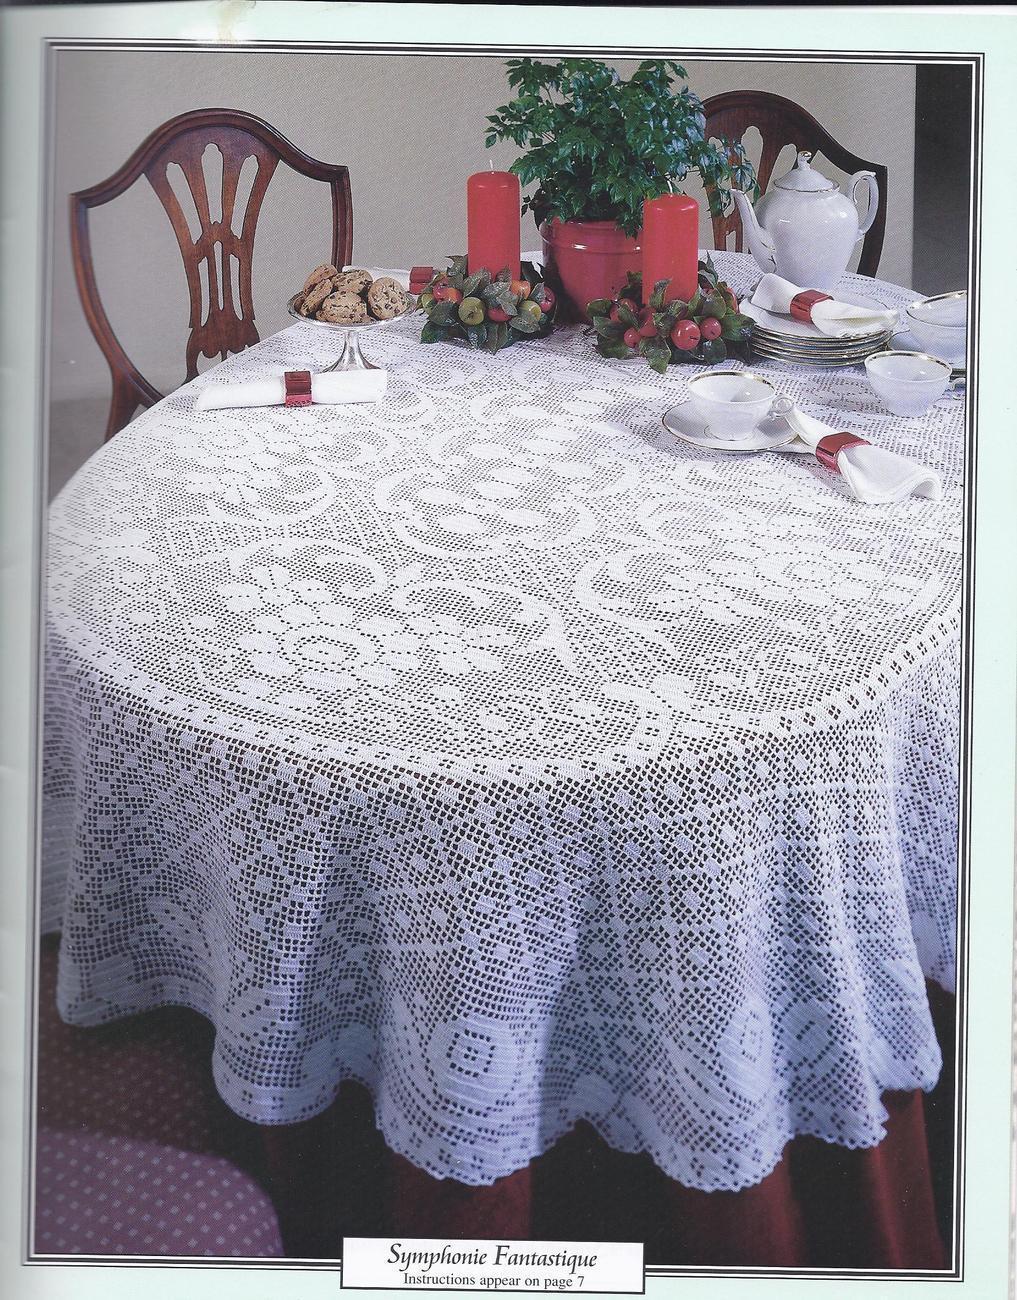 Gorgeous Oval Tablecloths Filet Crochet Patterns 5 Designs Home Decorators Catalog Best Ideas of Home Decor and Design [homedecoratorscatalog.us]